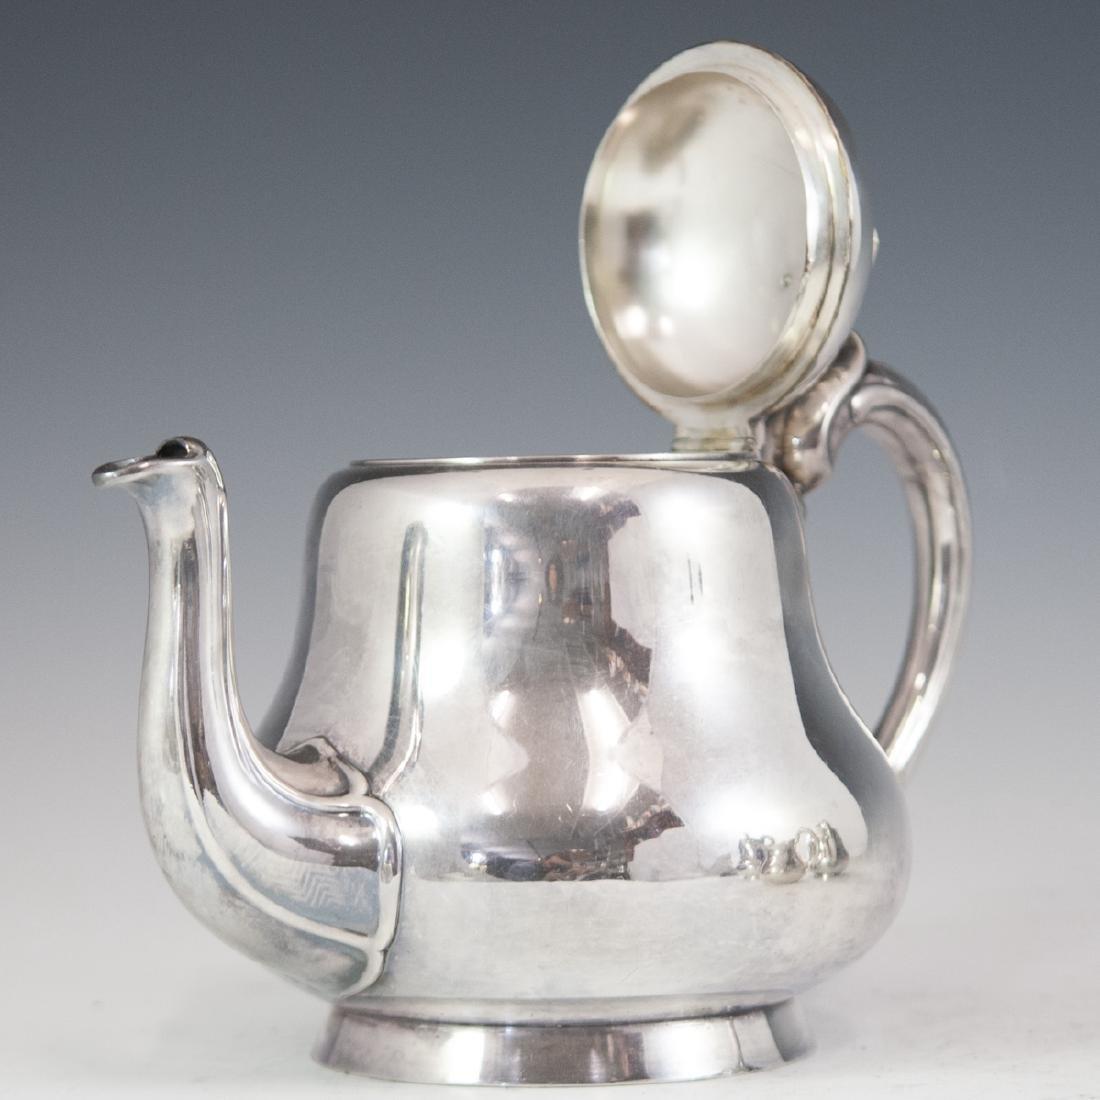 Antique Christofle Silverplated Tea Set - 4